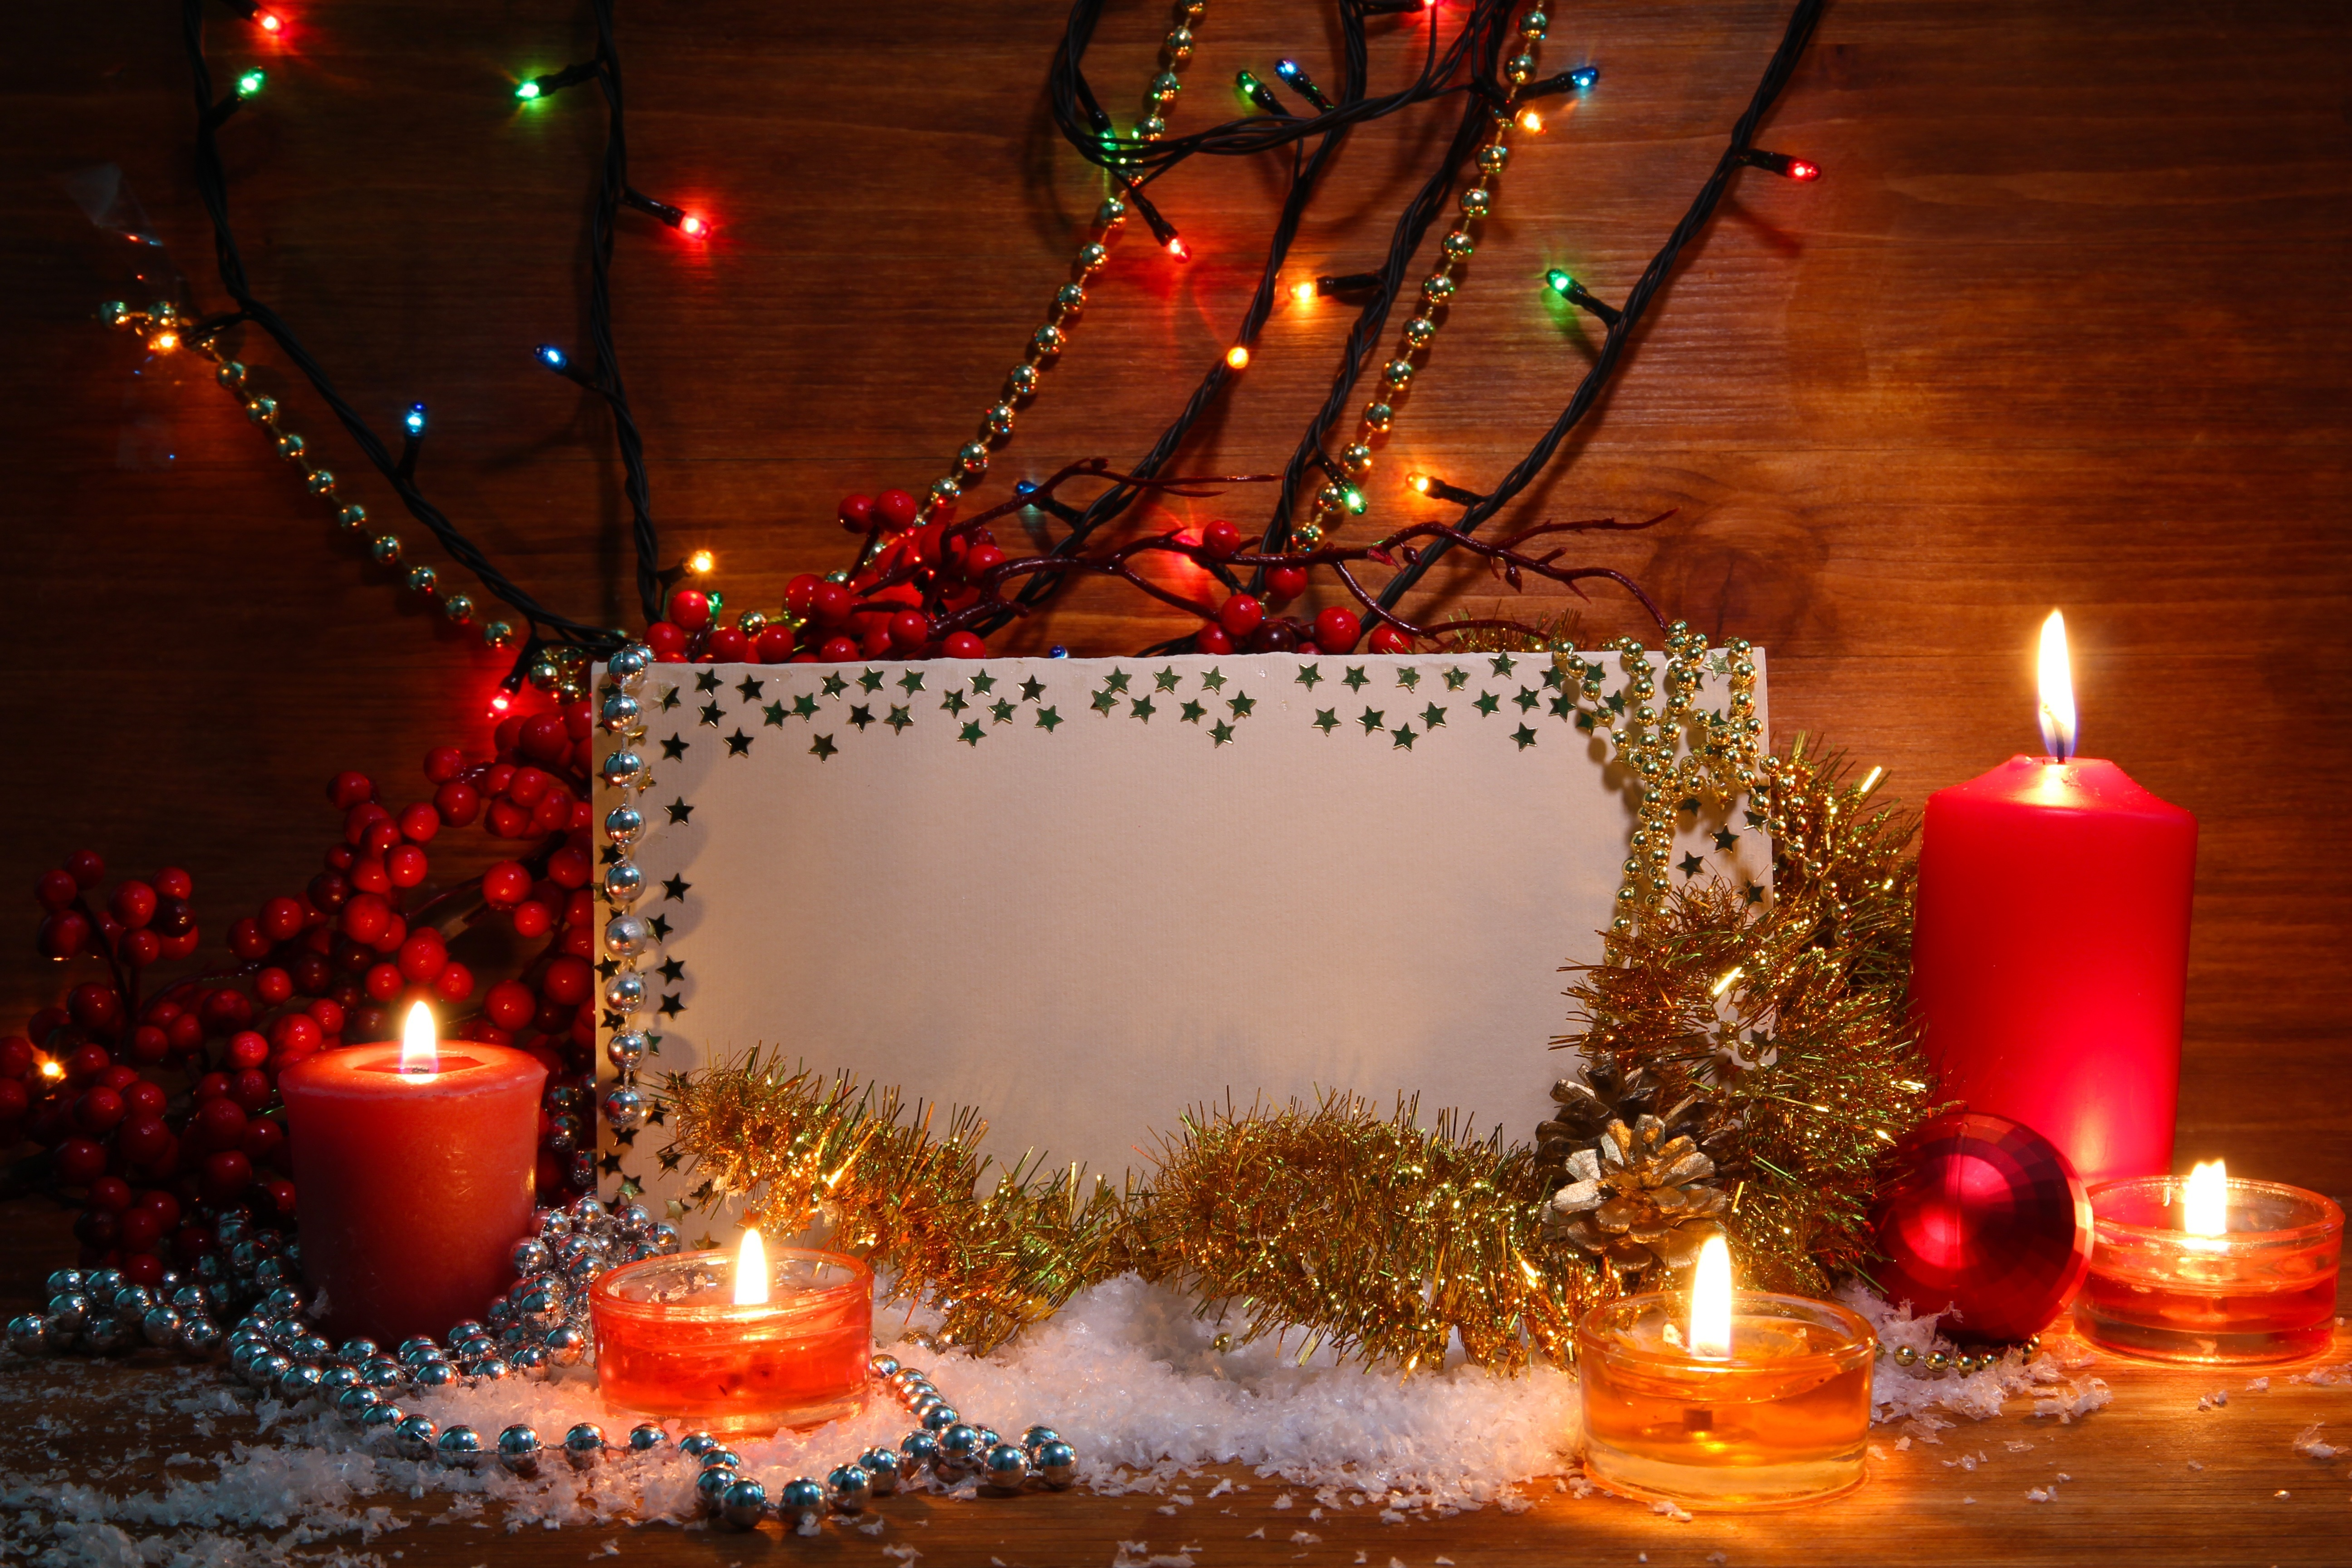 fonds d 39 ecran jour f ri s nouvel an bougies illuminations de no l t l charger photo. Black Bedroom Furniture Sets. Home Design Ideas